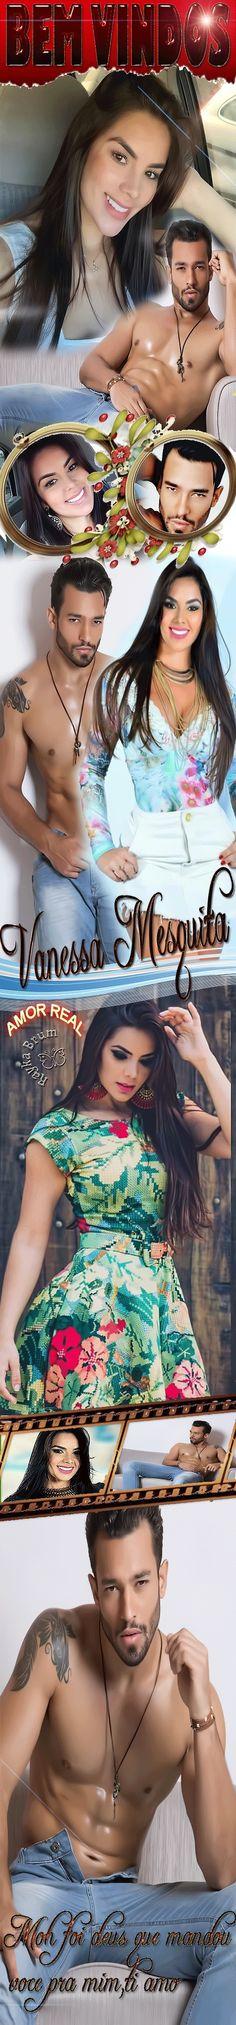 orkuti-Vanessa